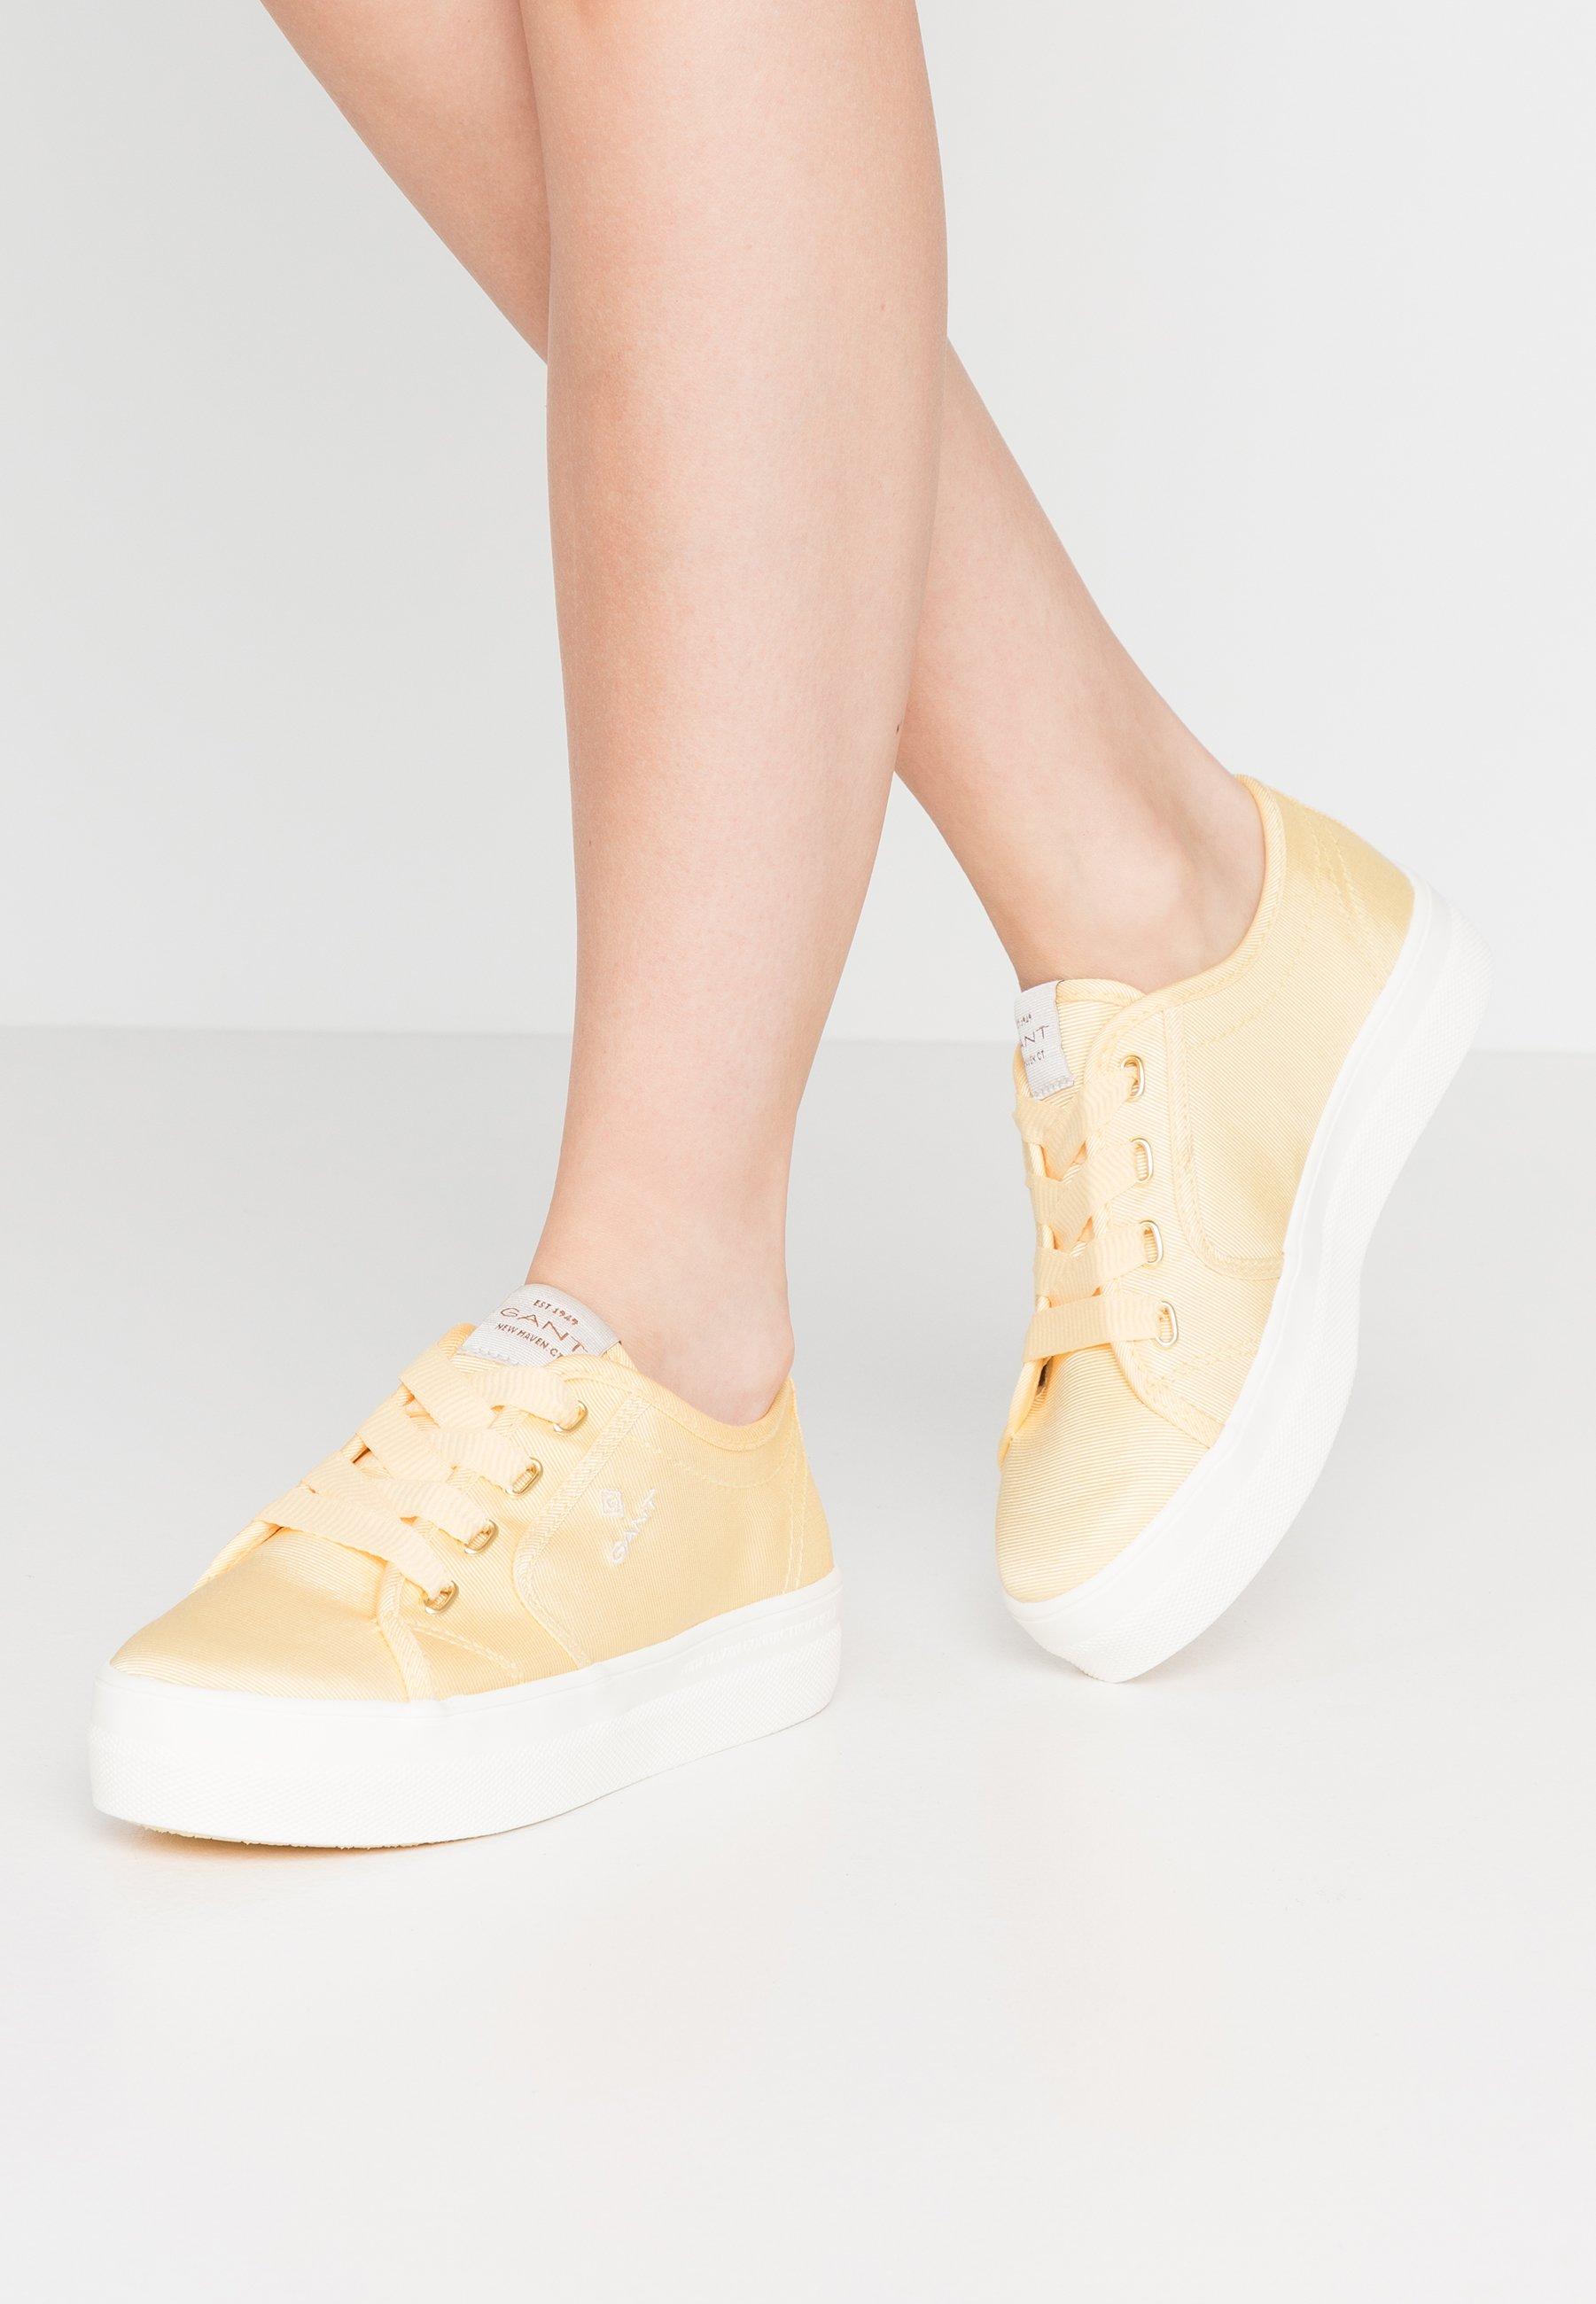 LEISHA Sneakers light yellow